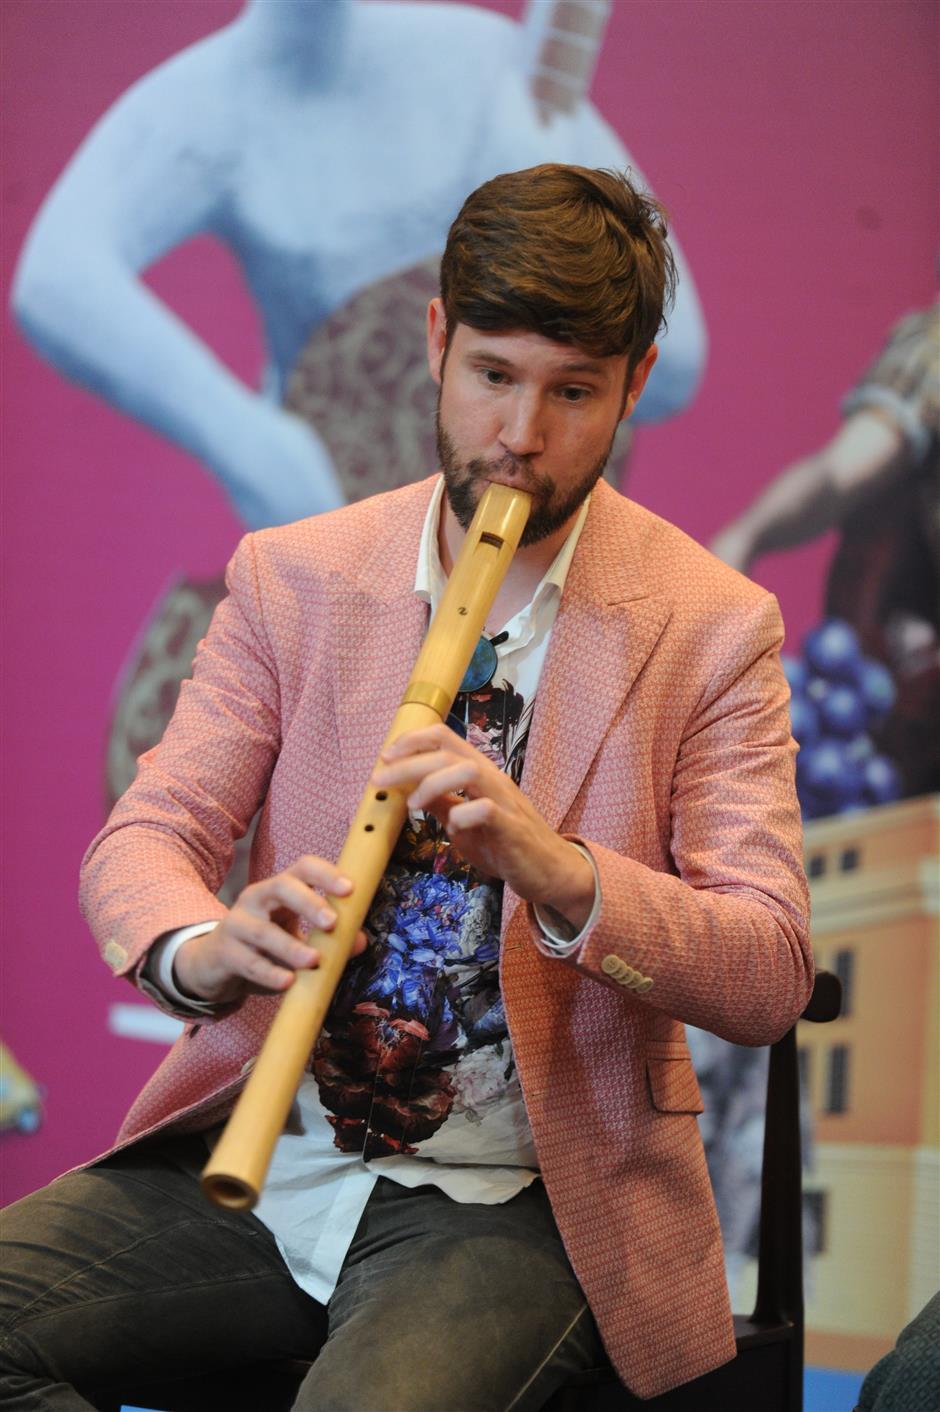 Mini music fest promises dulcet sounds of old European music